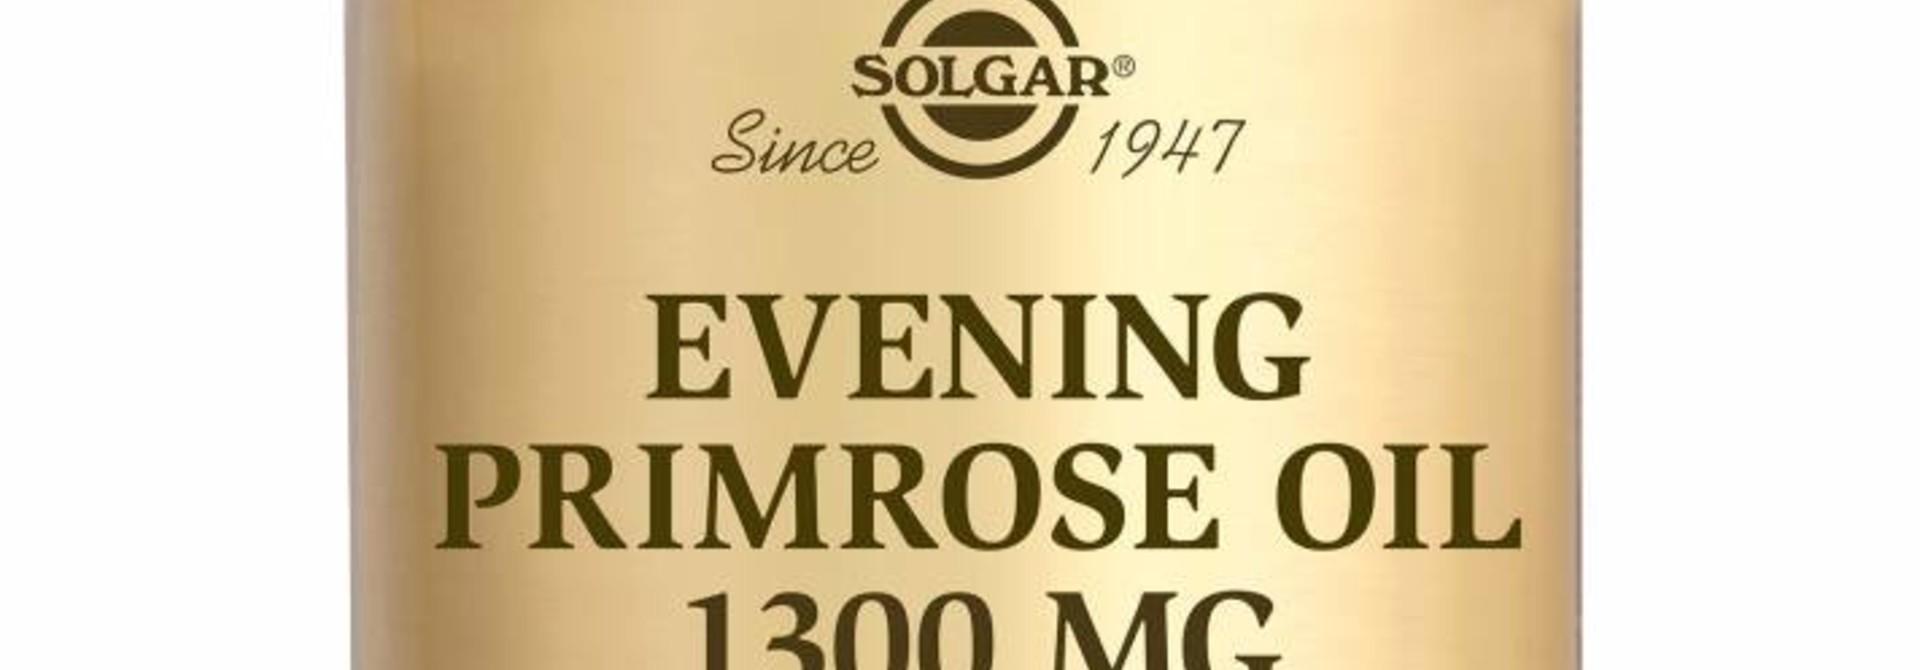 Evening Primrose Oil 1300 mg 30 softgels